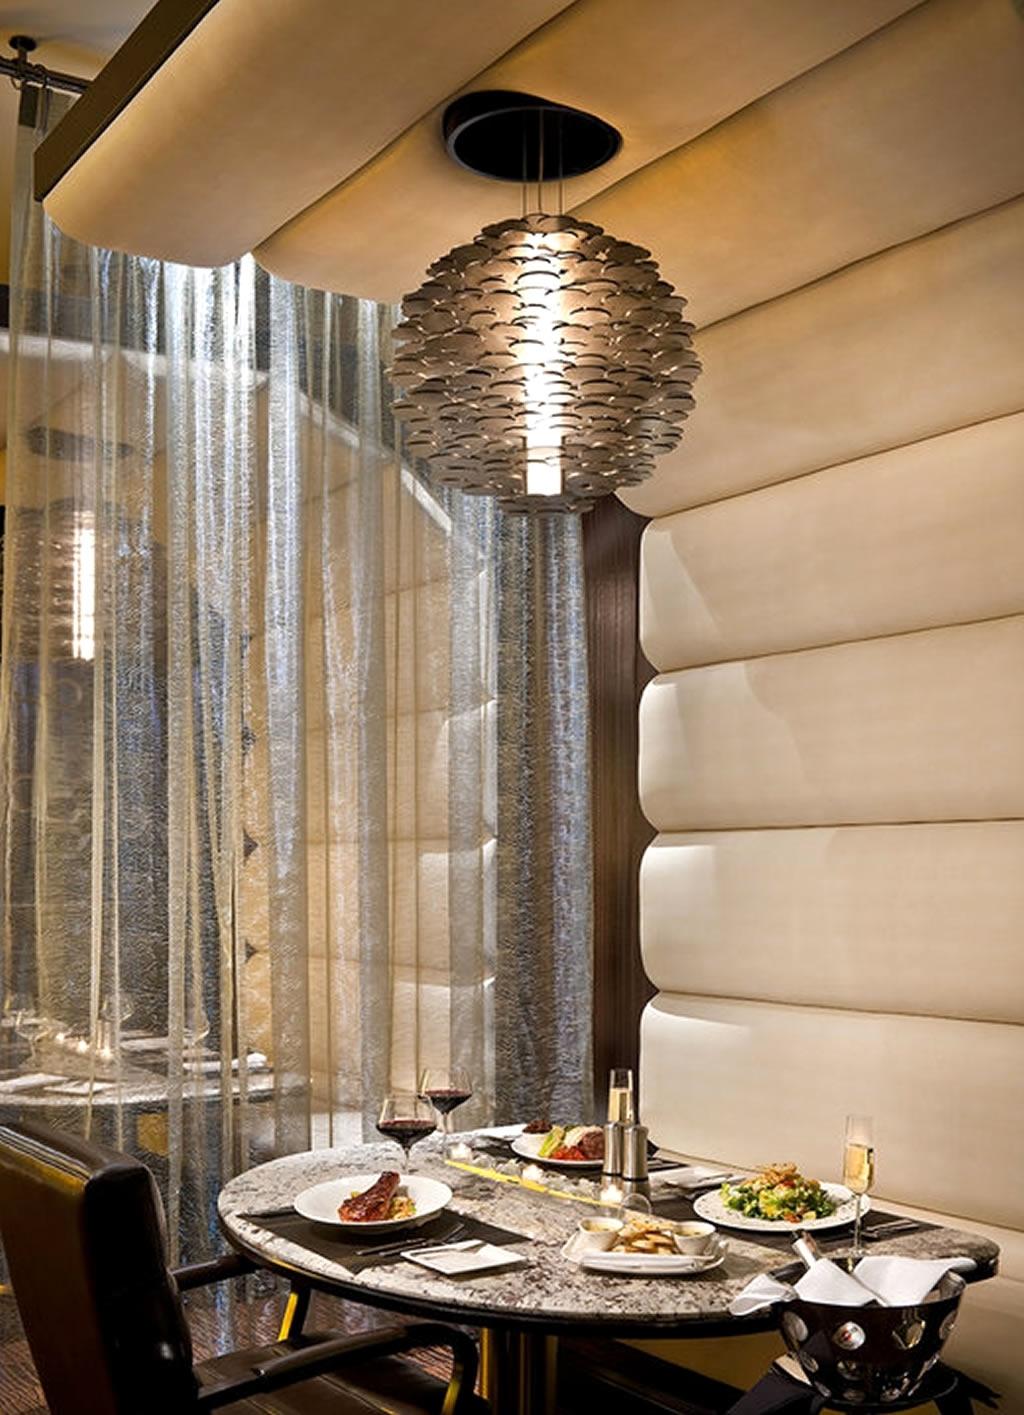 Most Popular Restaurant Chandelier Lighting Design Of Atlantis Steakhouse, Reno For Restaurant Chandeliers (View 10 of 15)